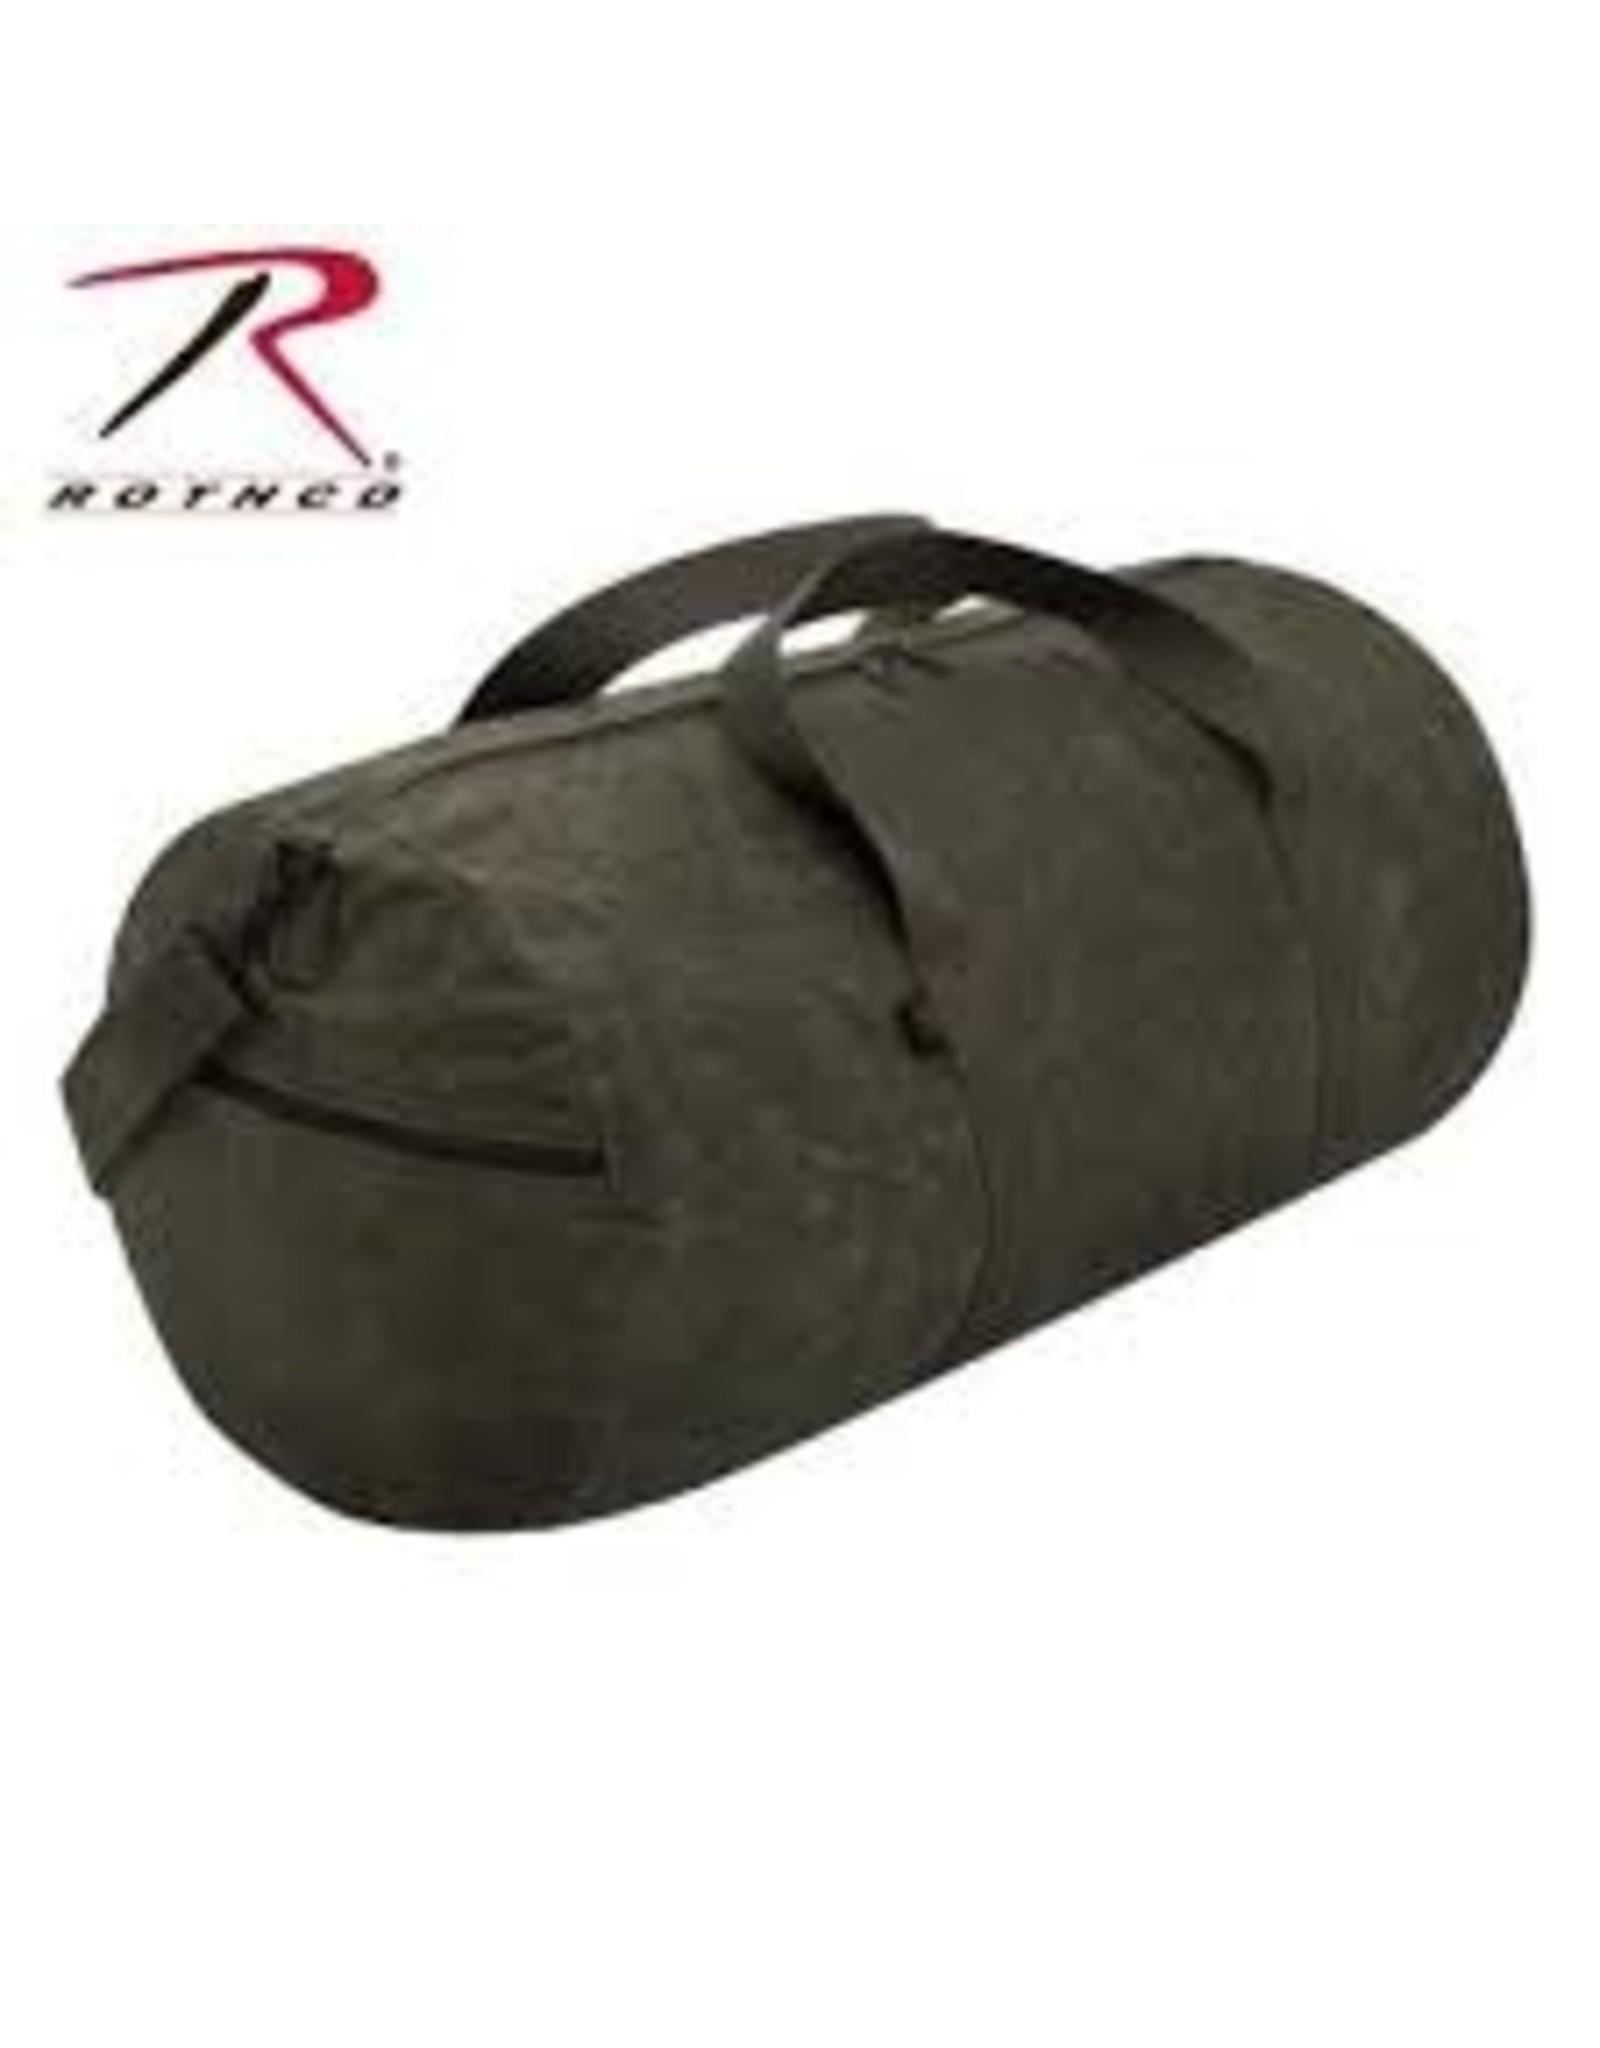 ROTHCO WAXED CANVAS SHOULDER DUFFLE BAG - 19 INCH